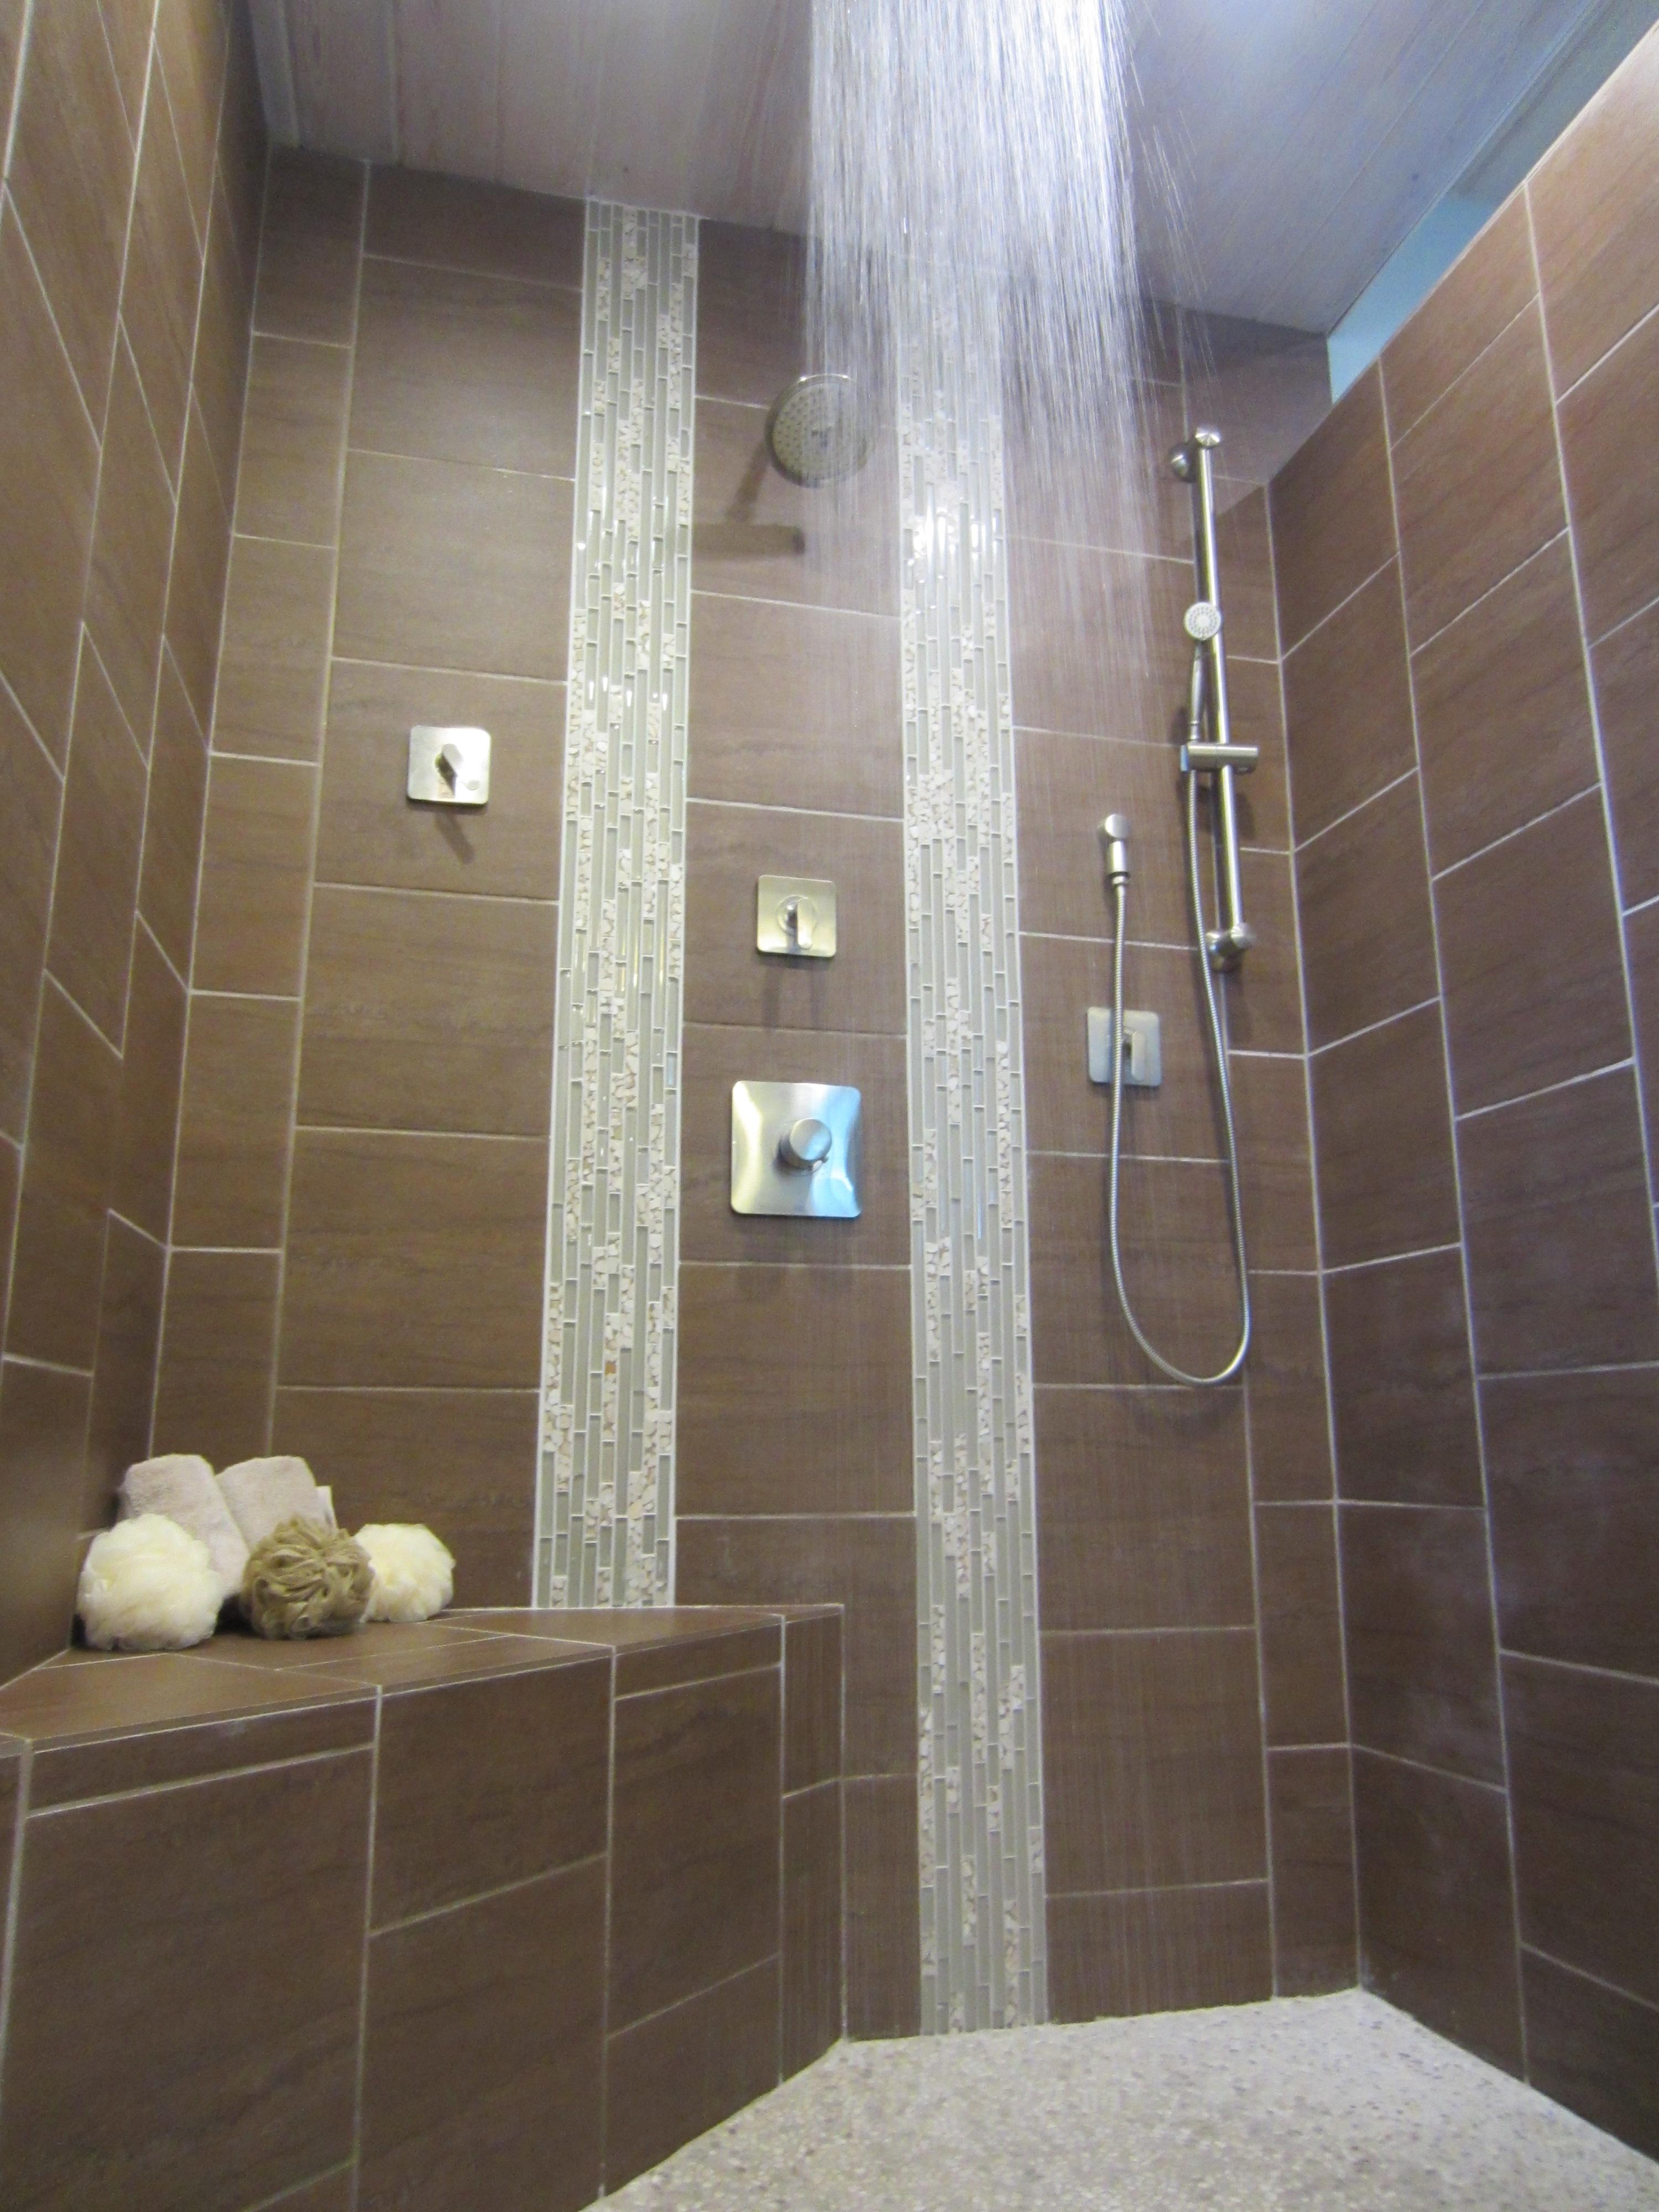 Design Elements: Tile Design   Stylish Living with RCI on Bathroom Tile Pattern Design  id=97762